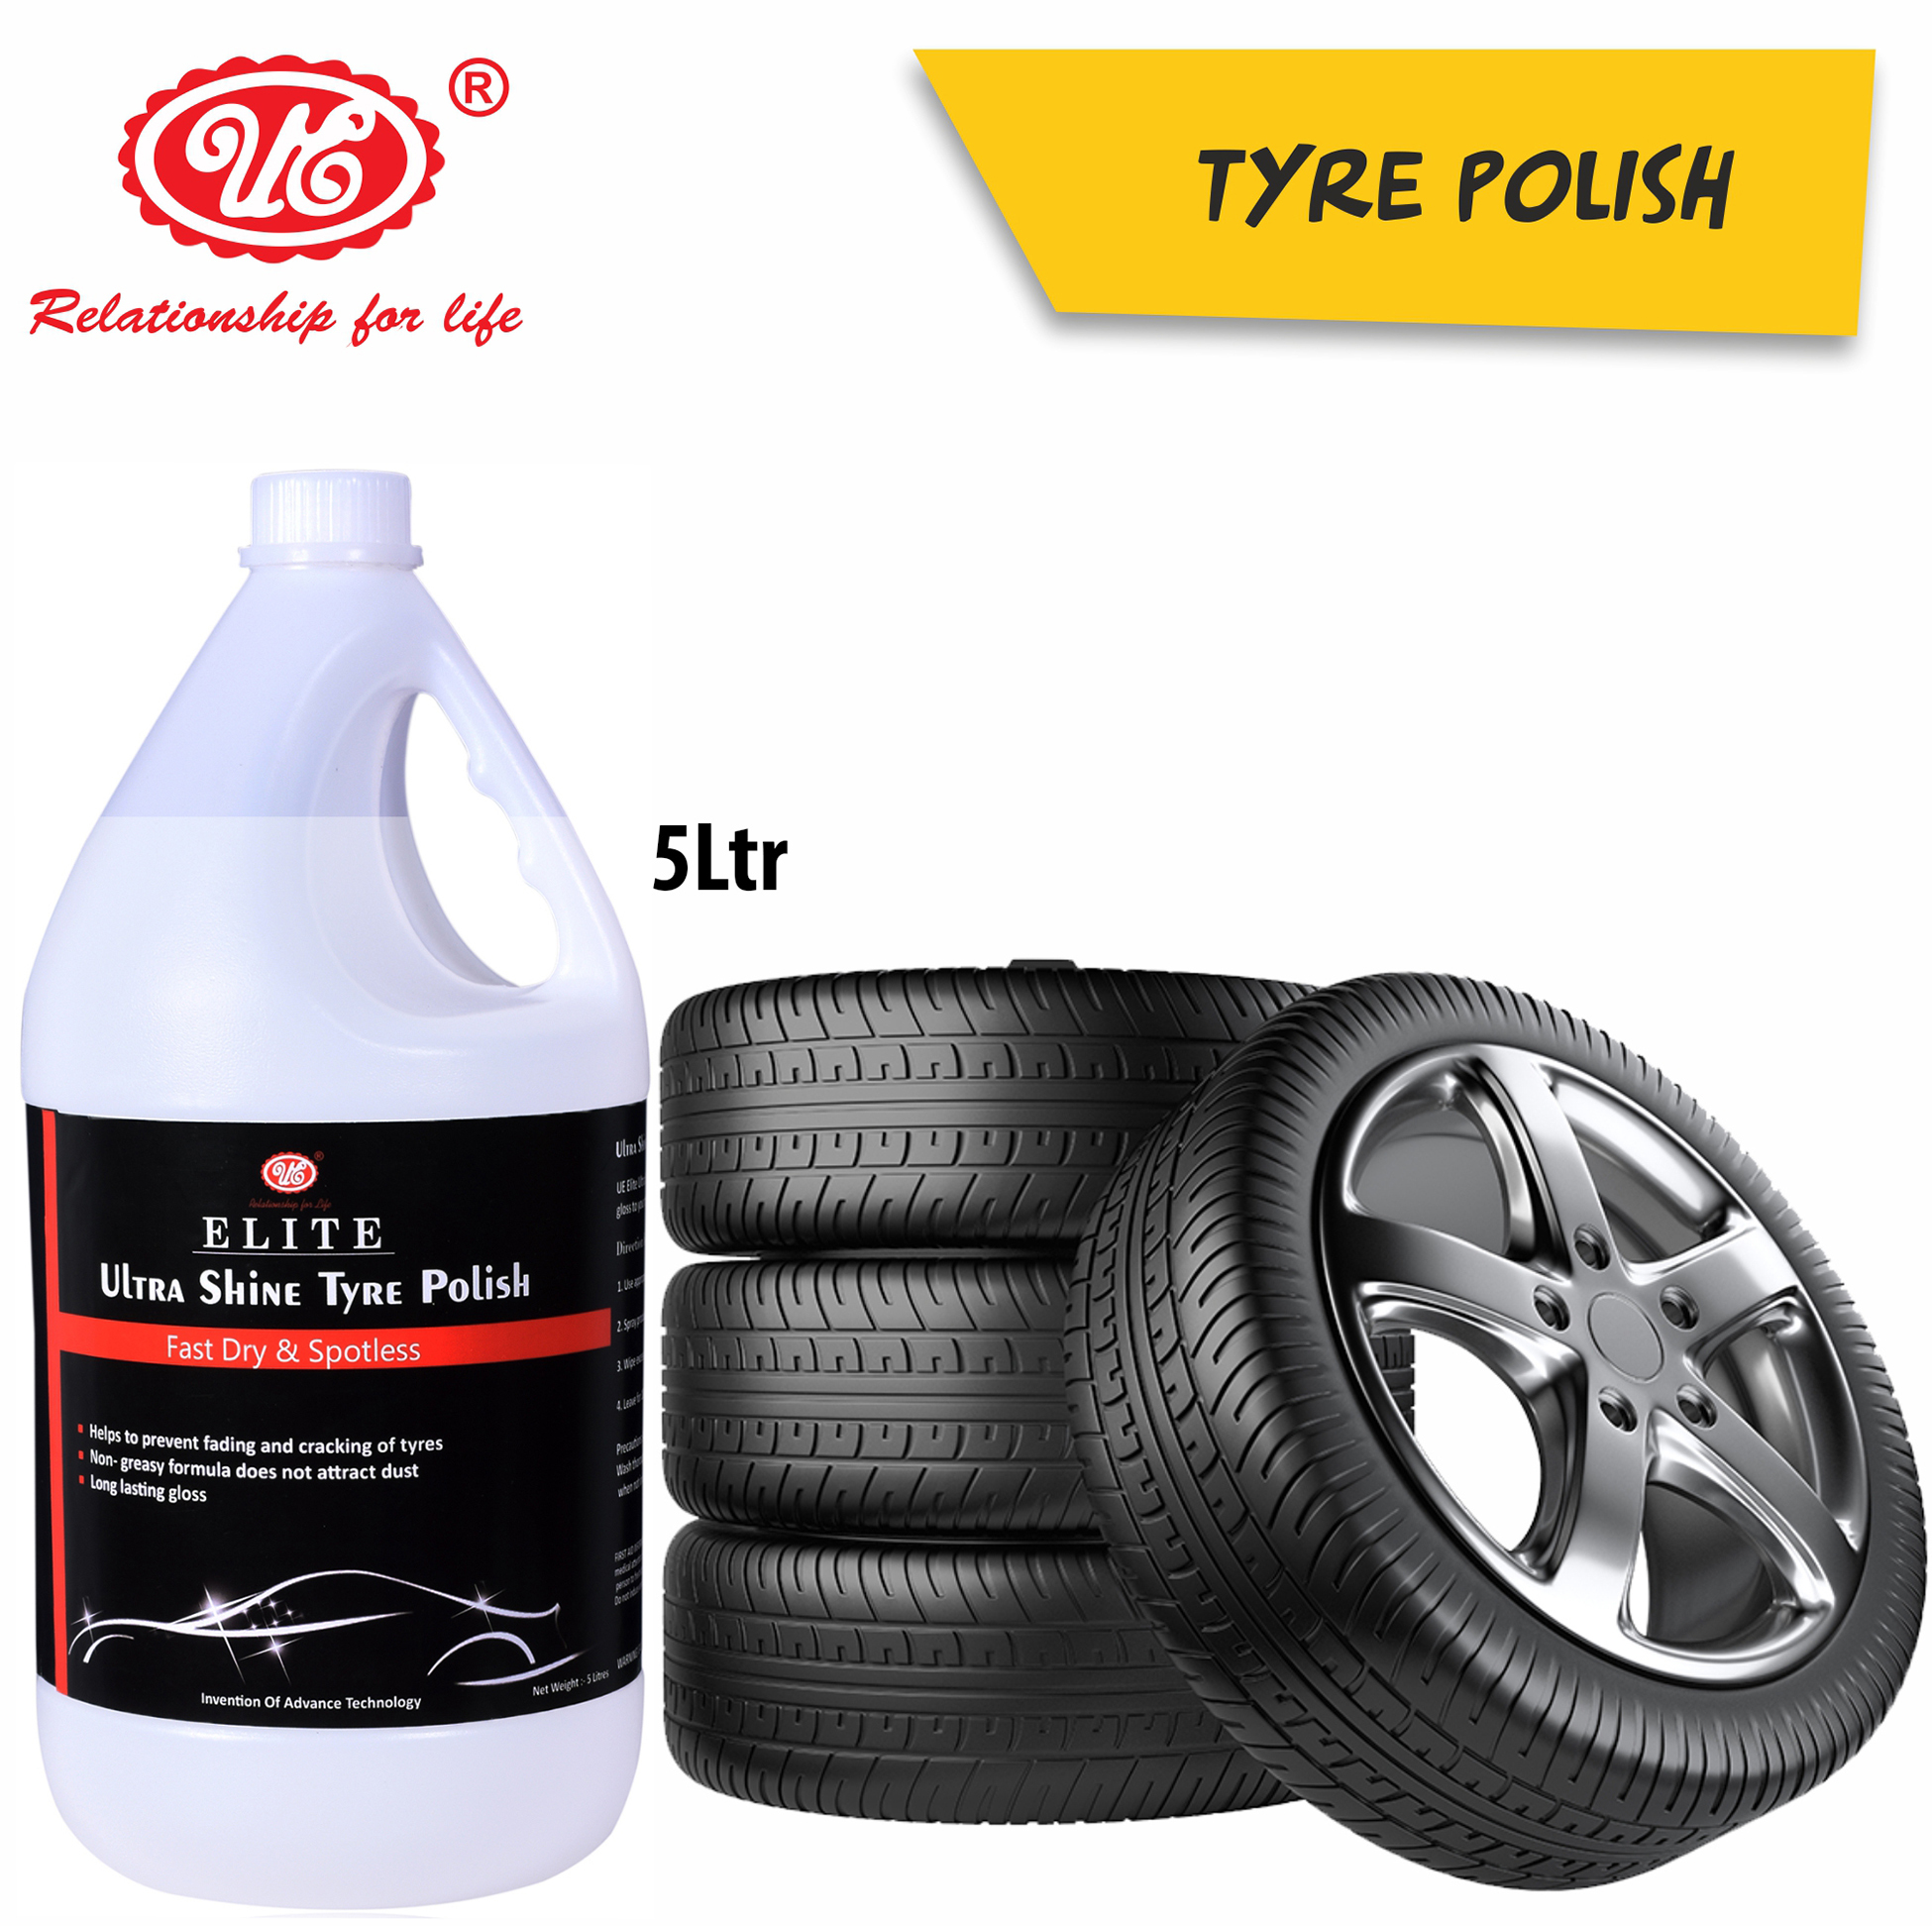 Ue Tyre Polish